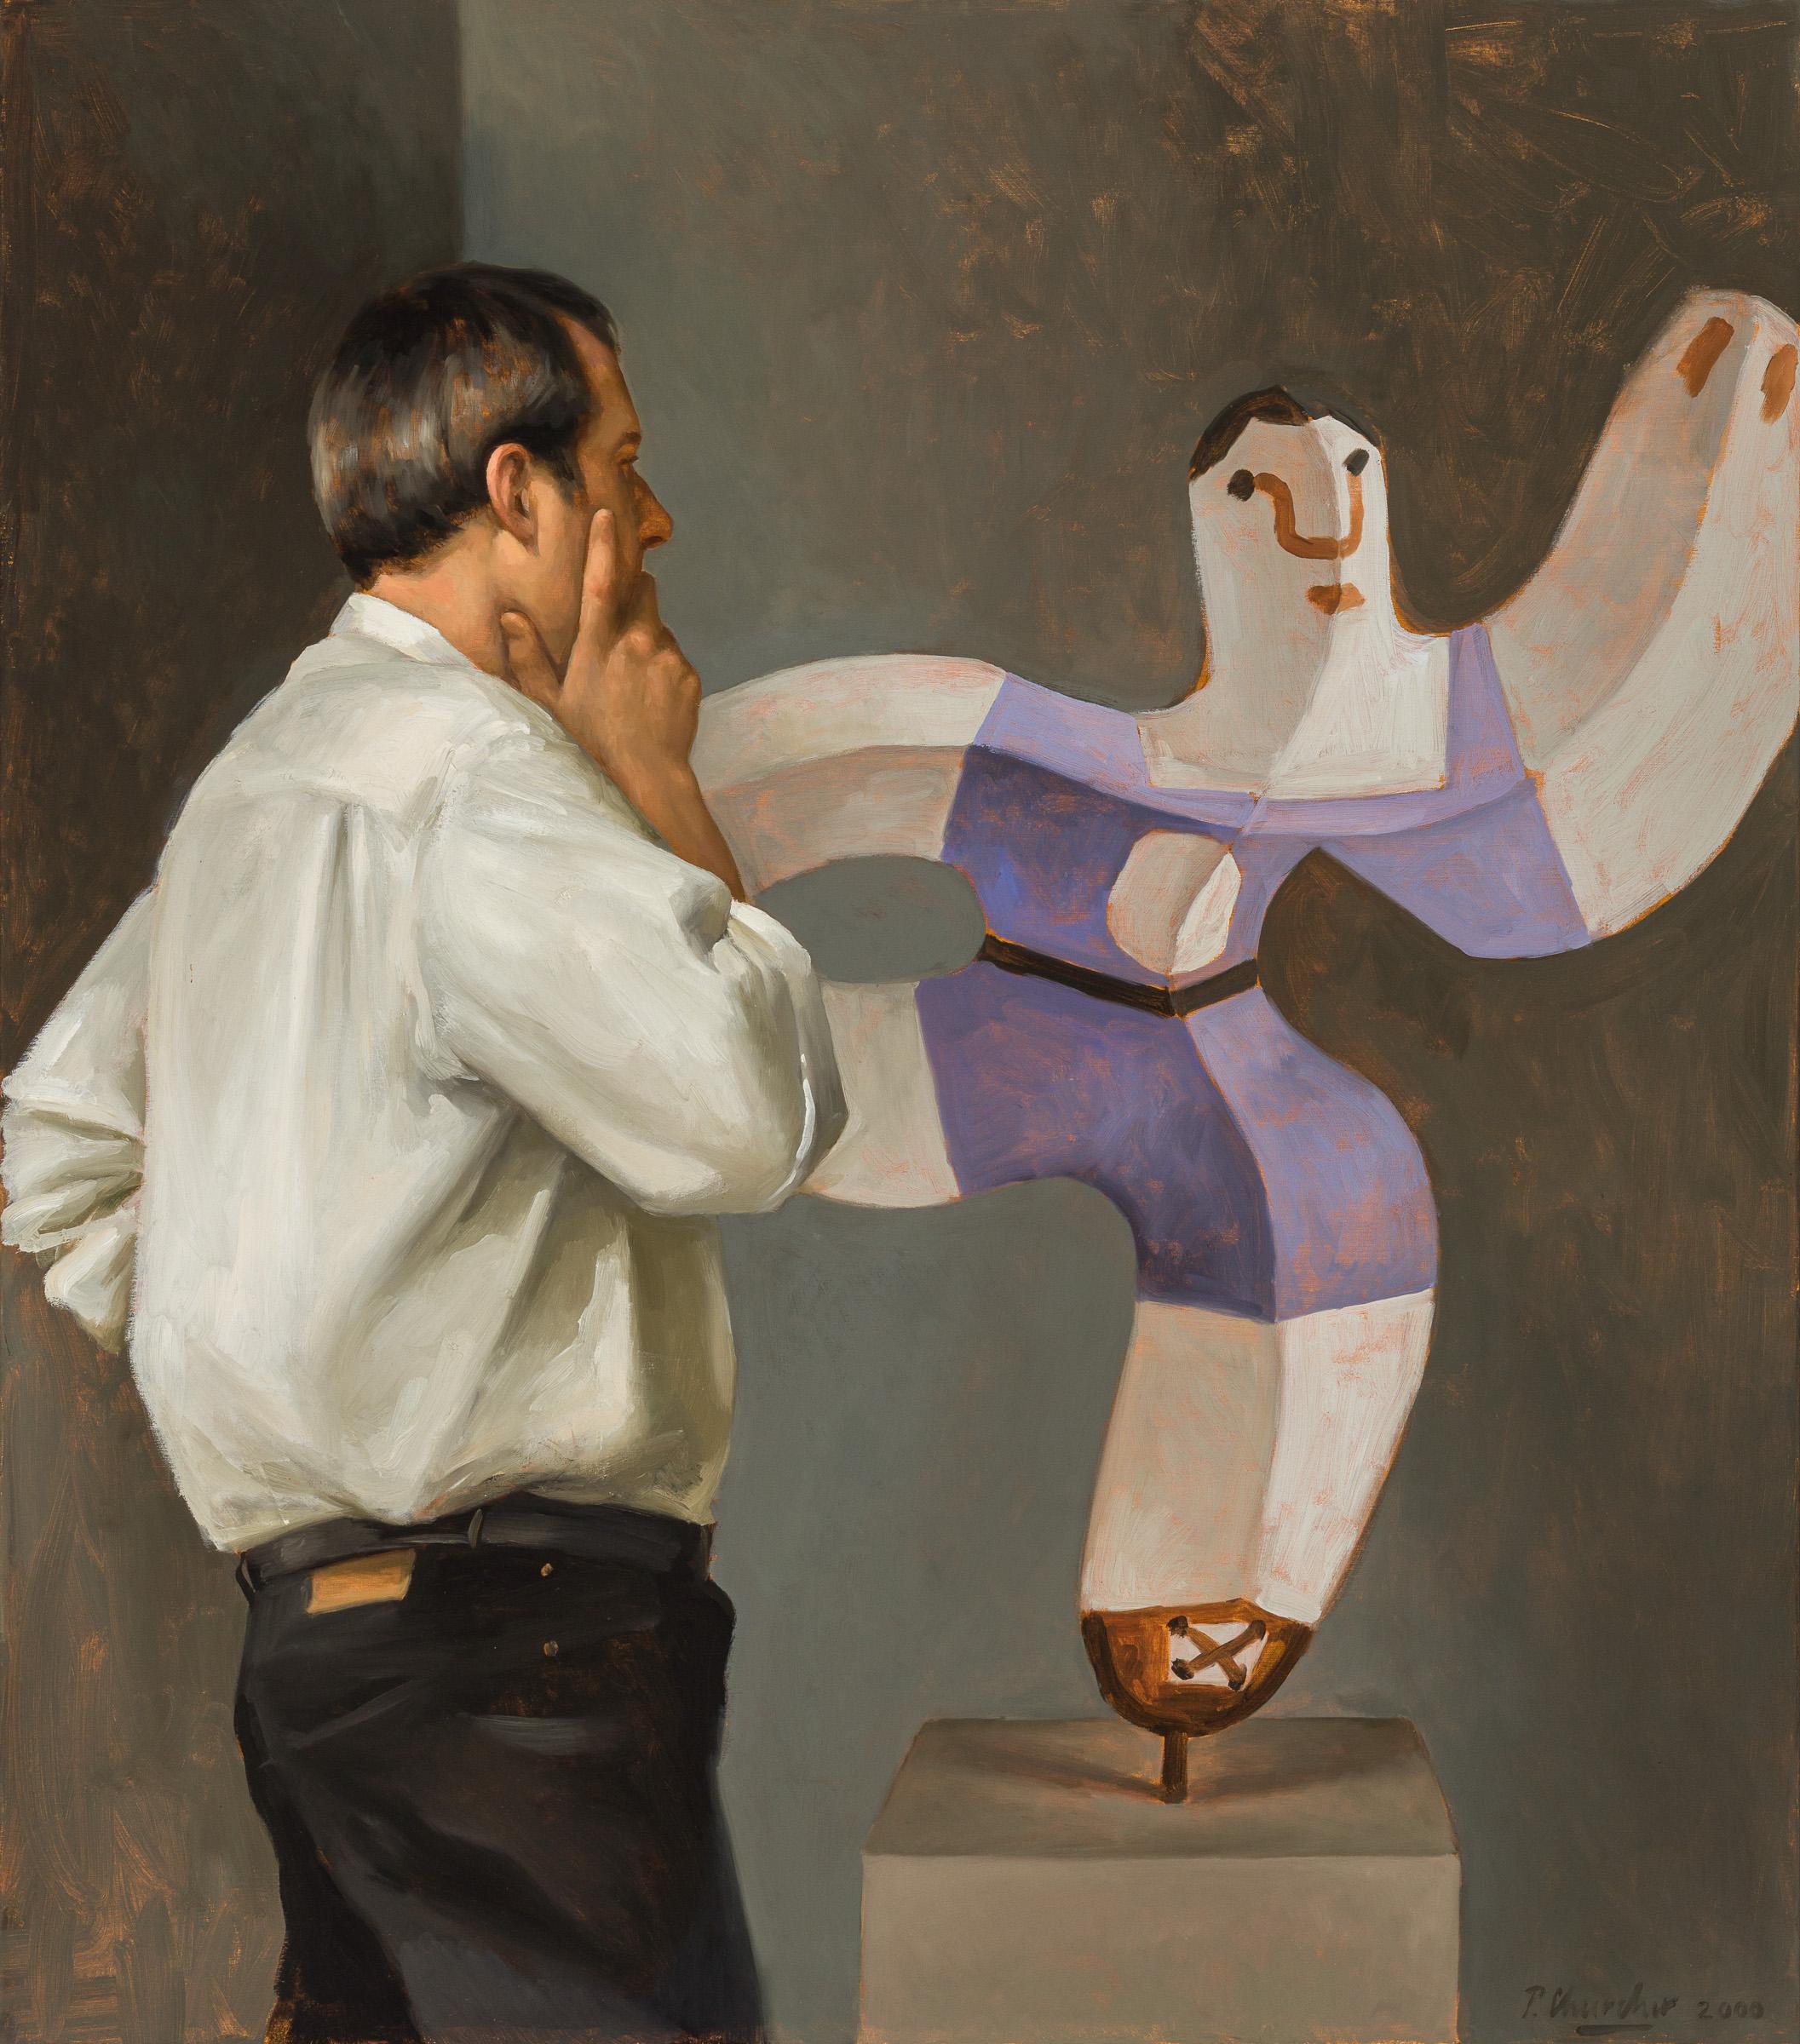 Churcher Regarding Picasso